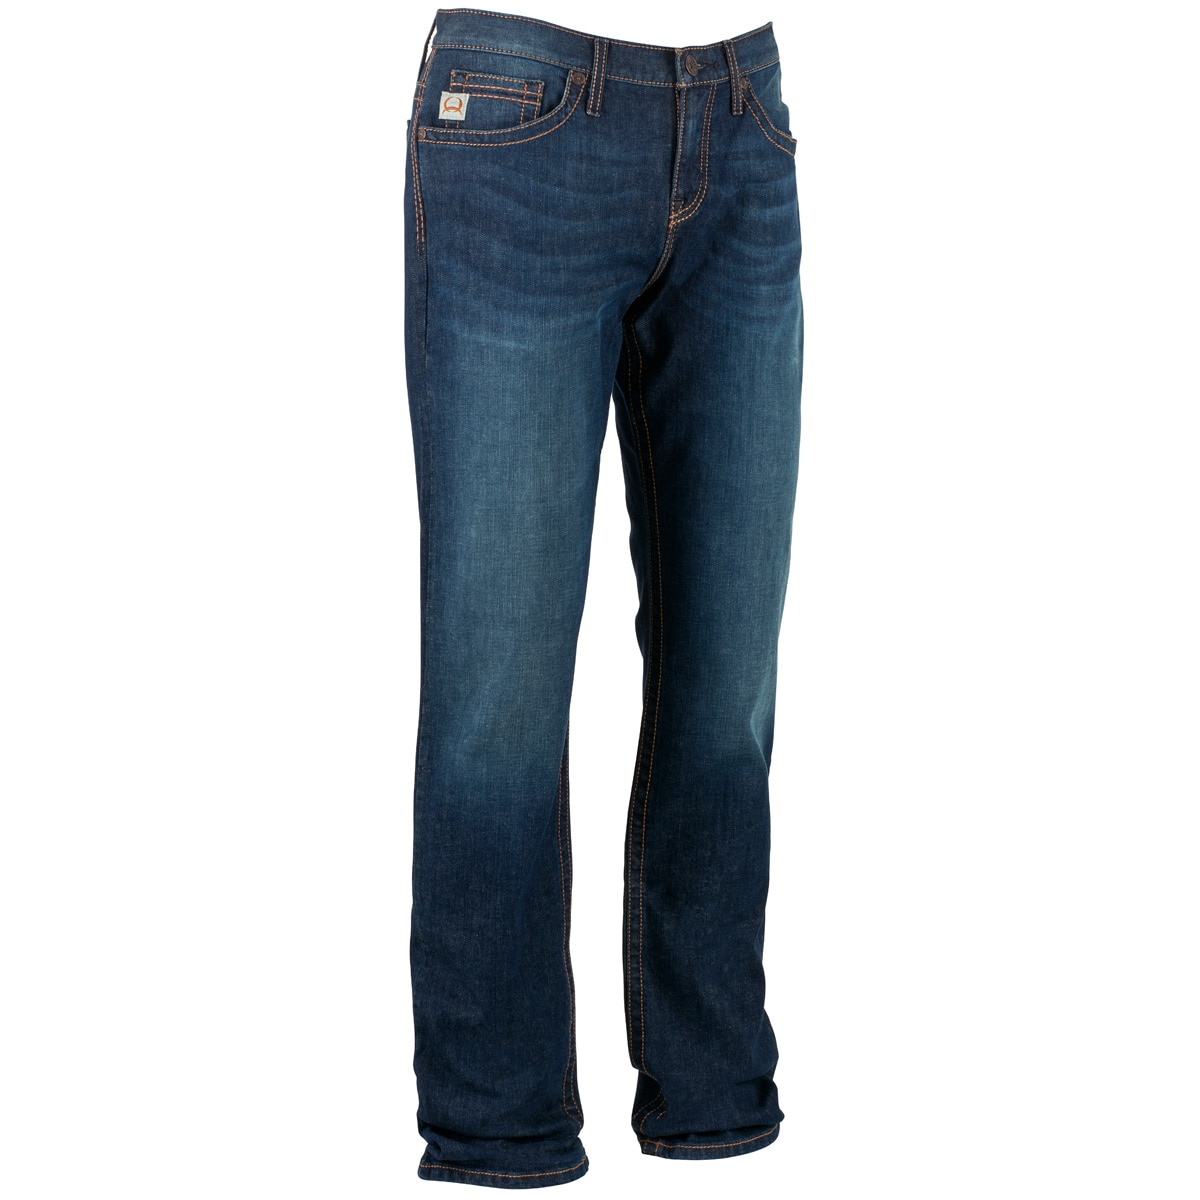 f1aefda2 Cinch Men's Ian Jeans With 360 Flex Denim - Mid Rise Slim Bootcut. Cinch |  Item #27670. write a review